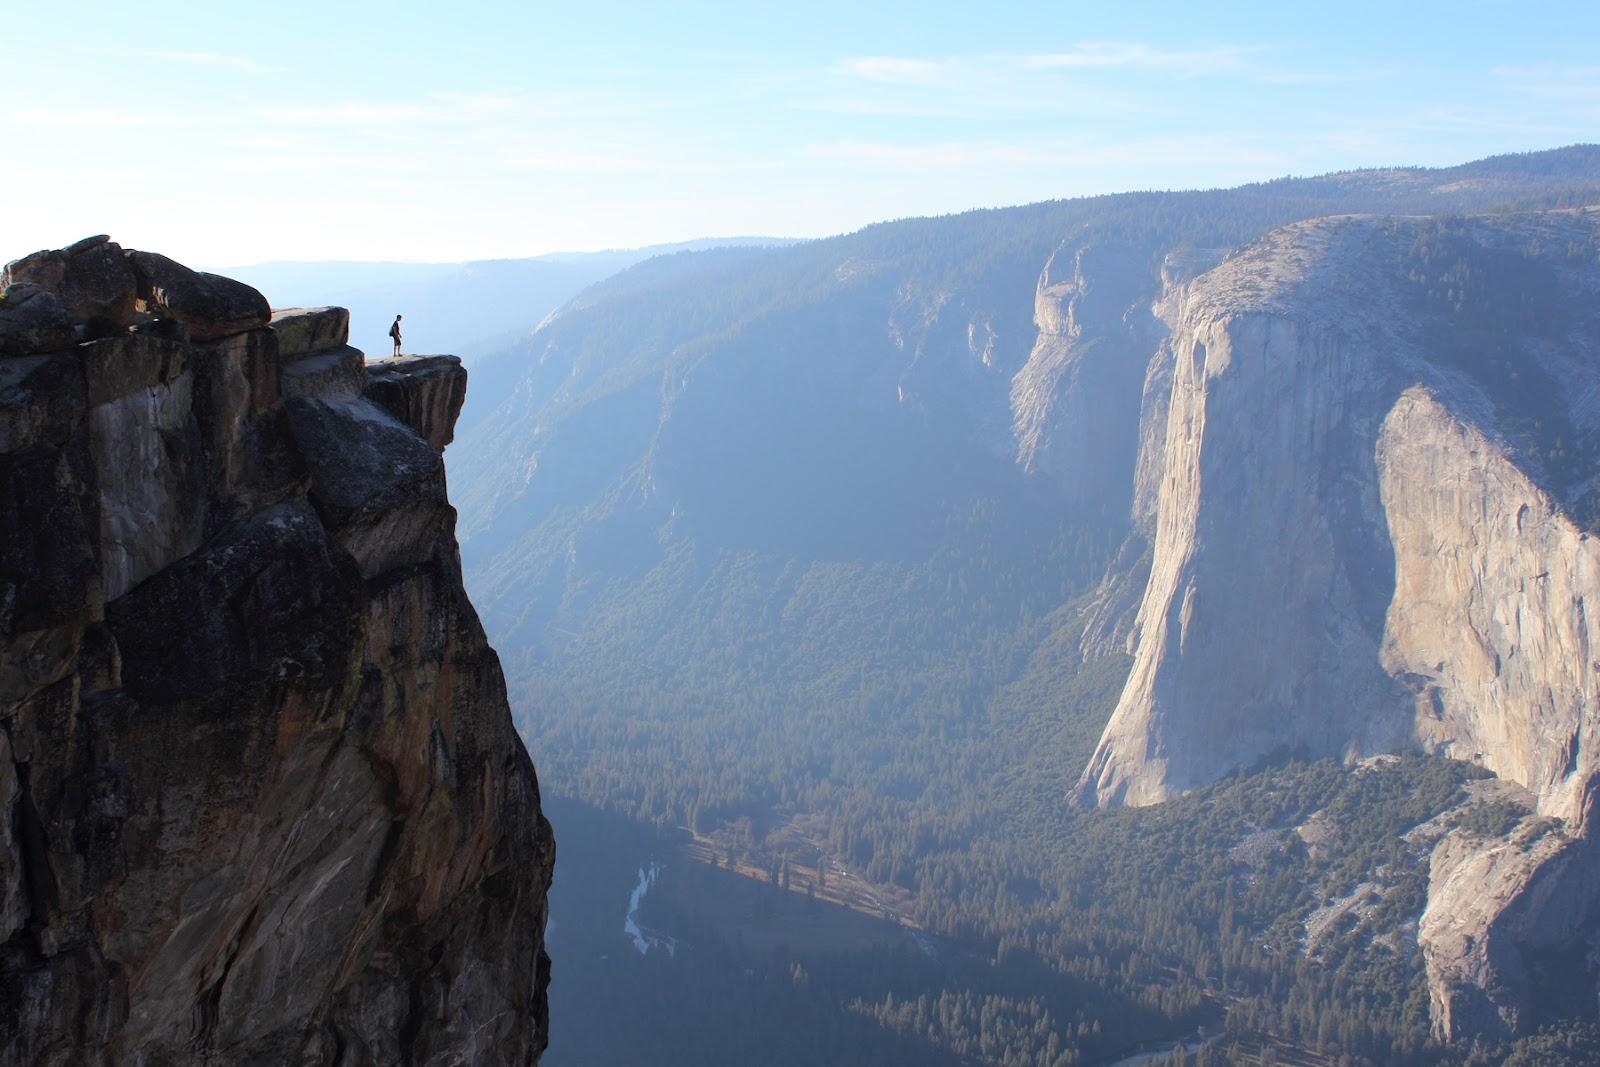 El Capitan as seen from Taft Point